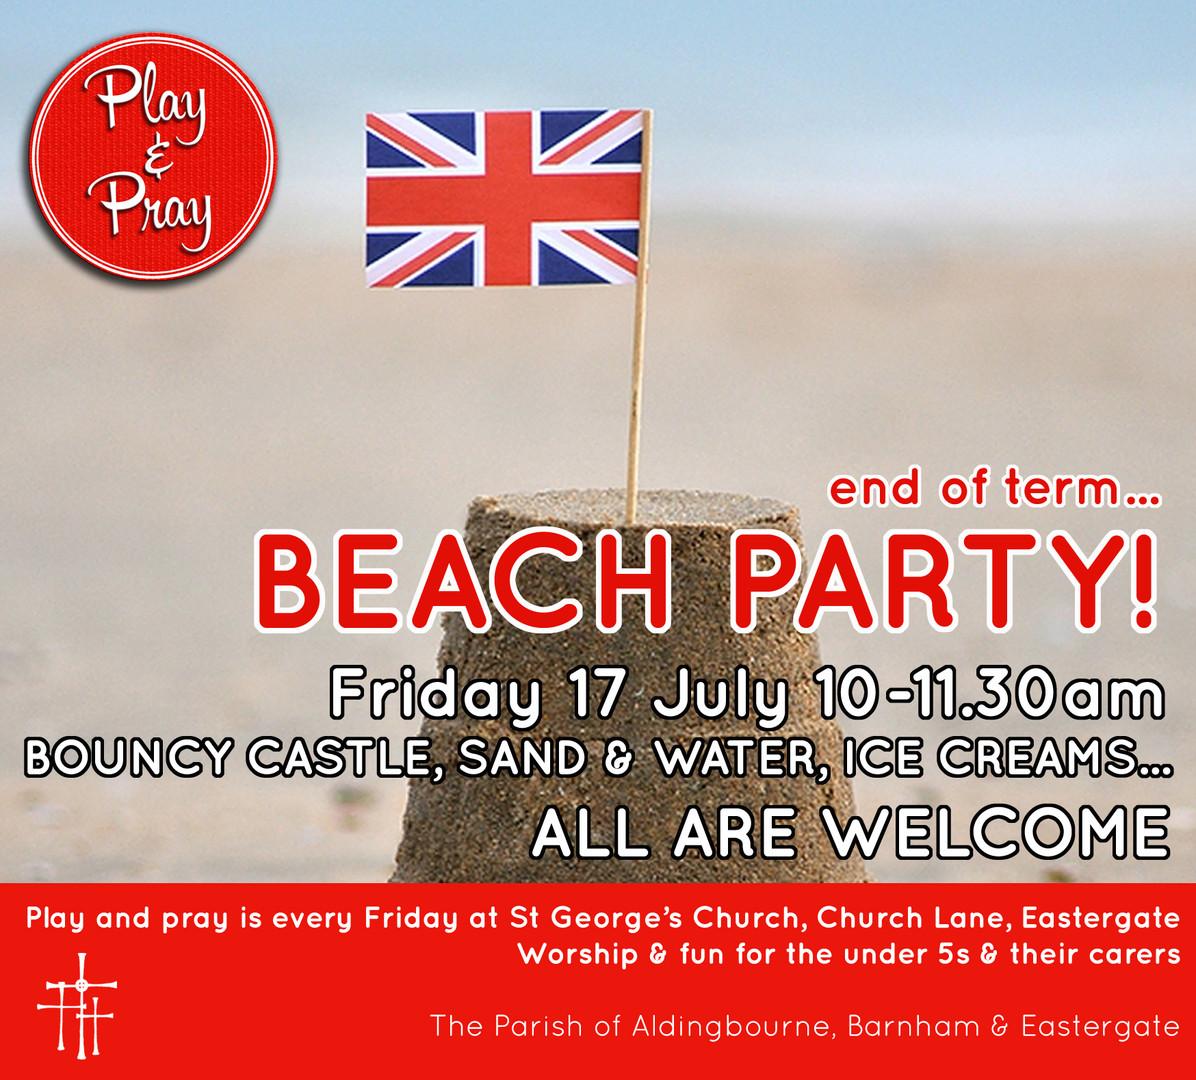 Beach Party copy.jpg